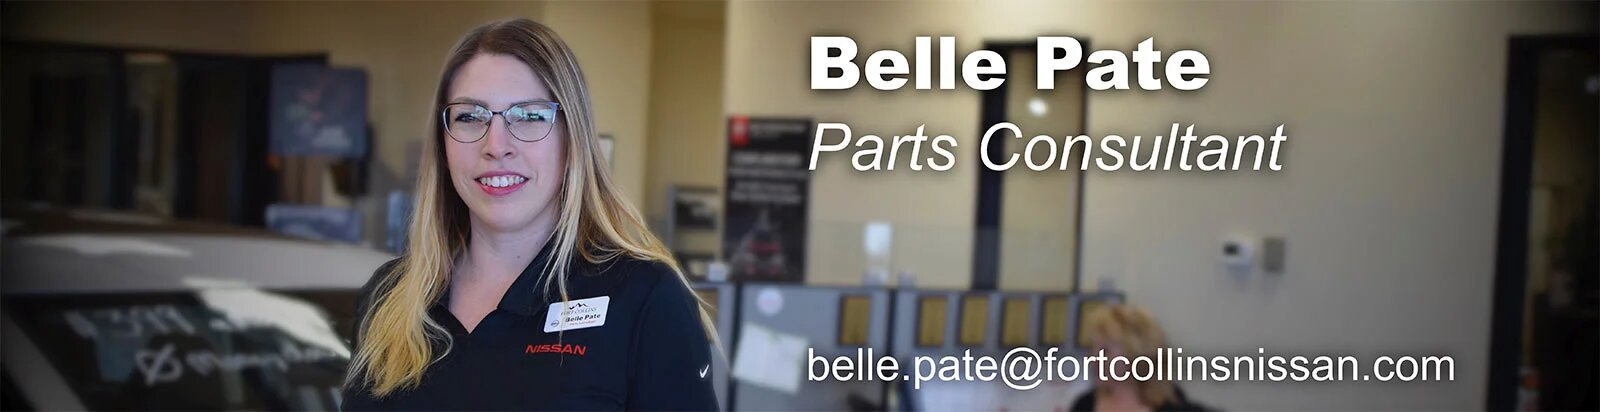 Belle Pate